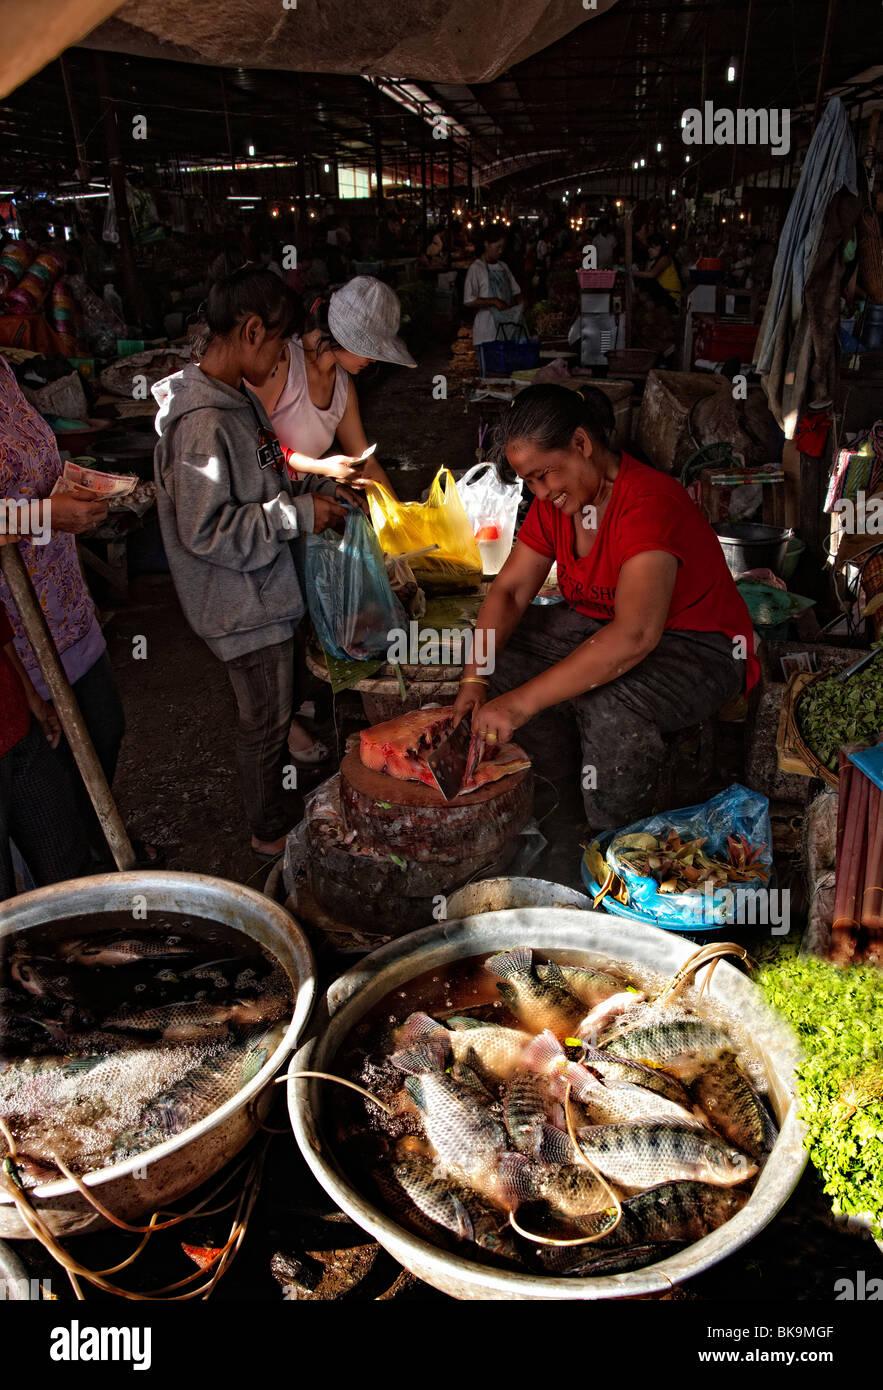 Woman fish seller cutting fish, food market, Vientiane, Laos - Stock Image